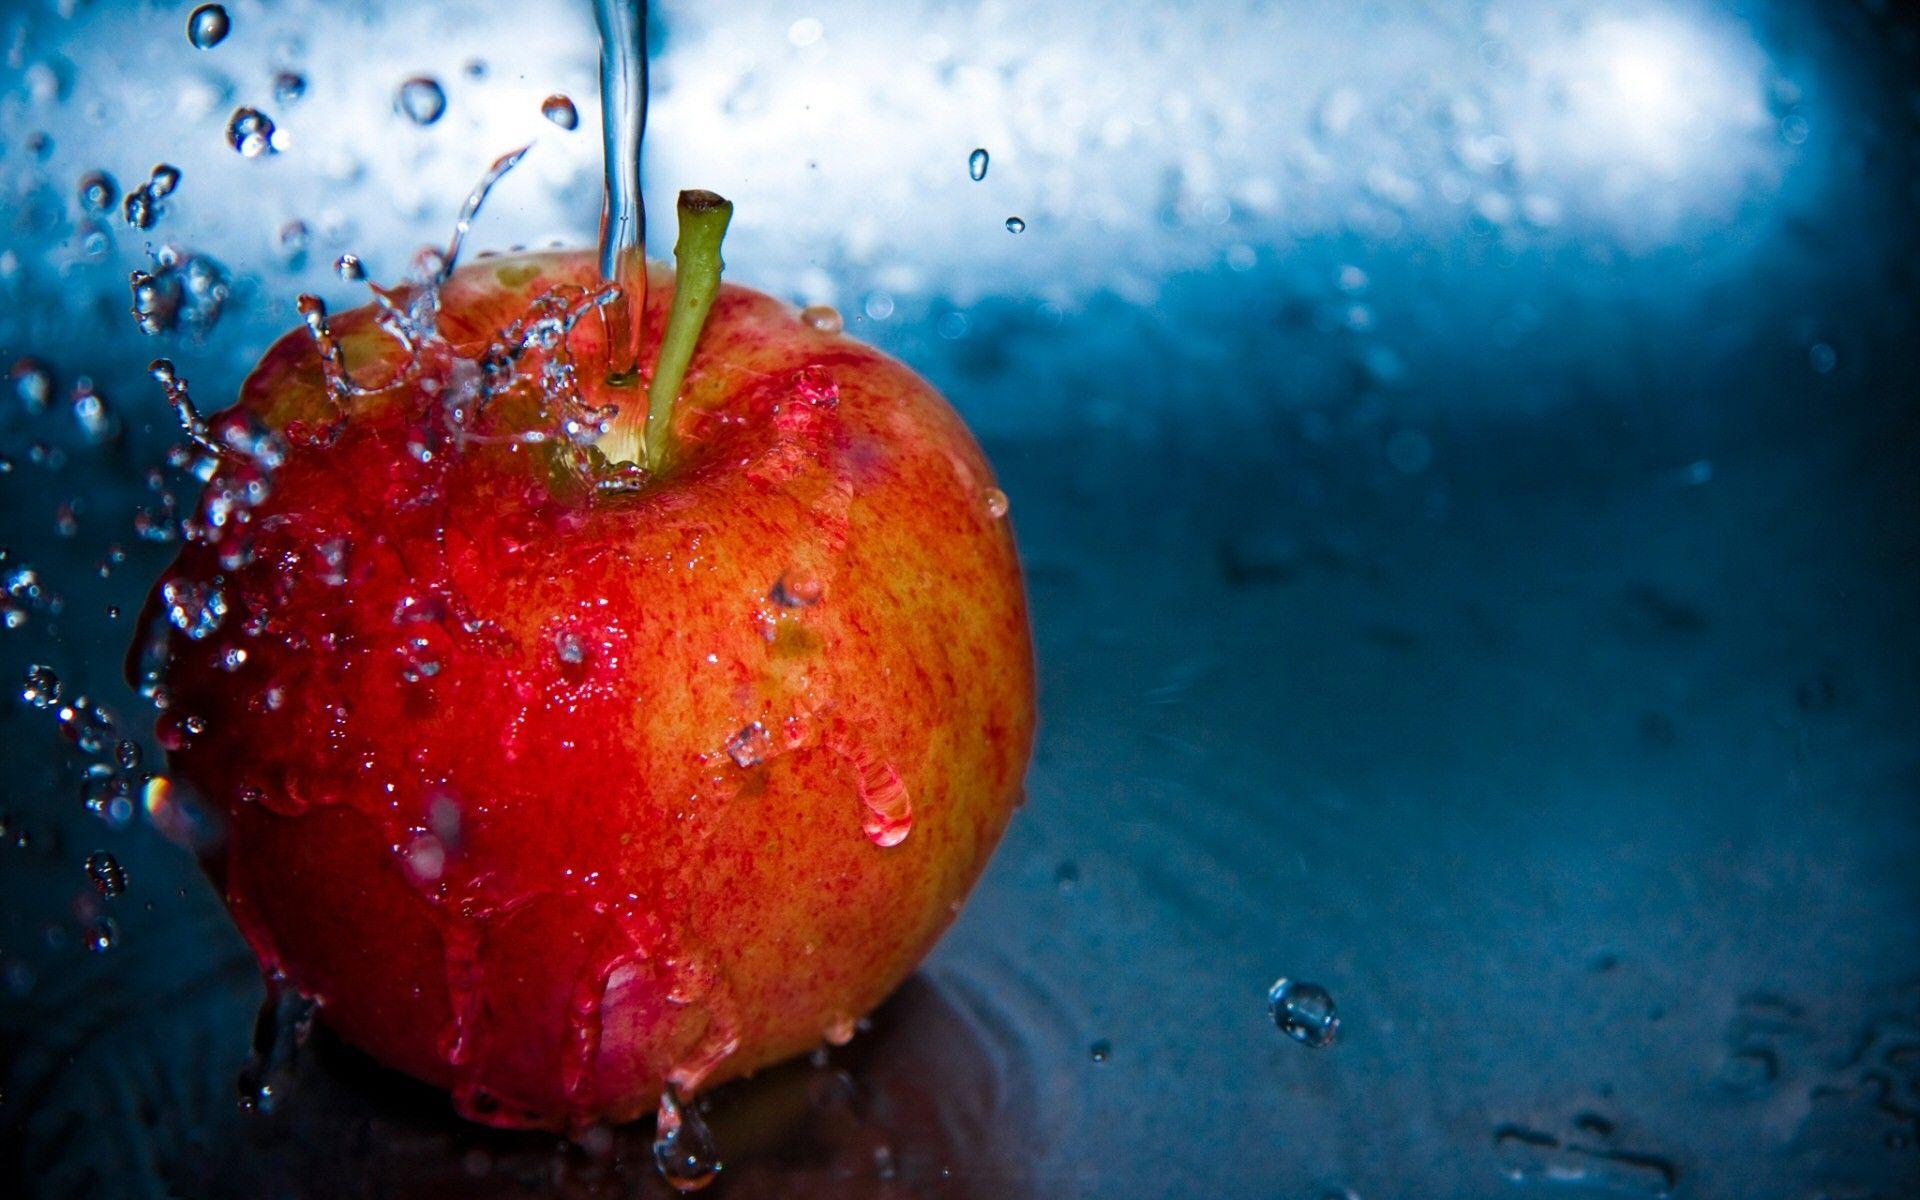 Apple Fruit - Wallpapers-HD Wallpapers-Laptop Wallpapers ...